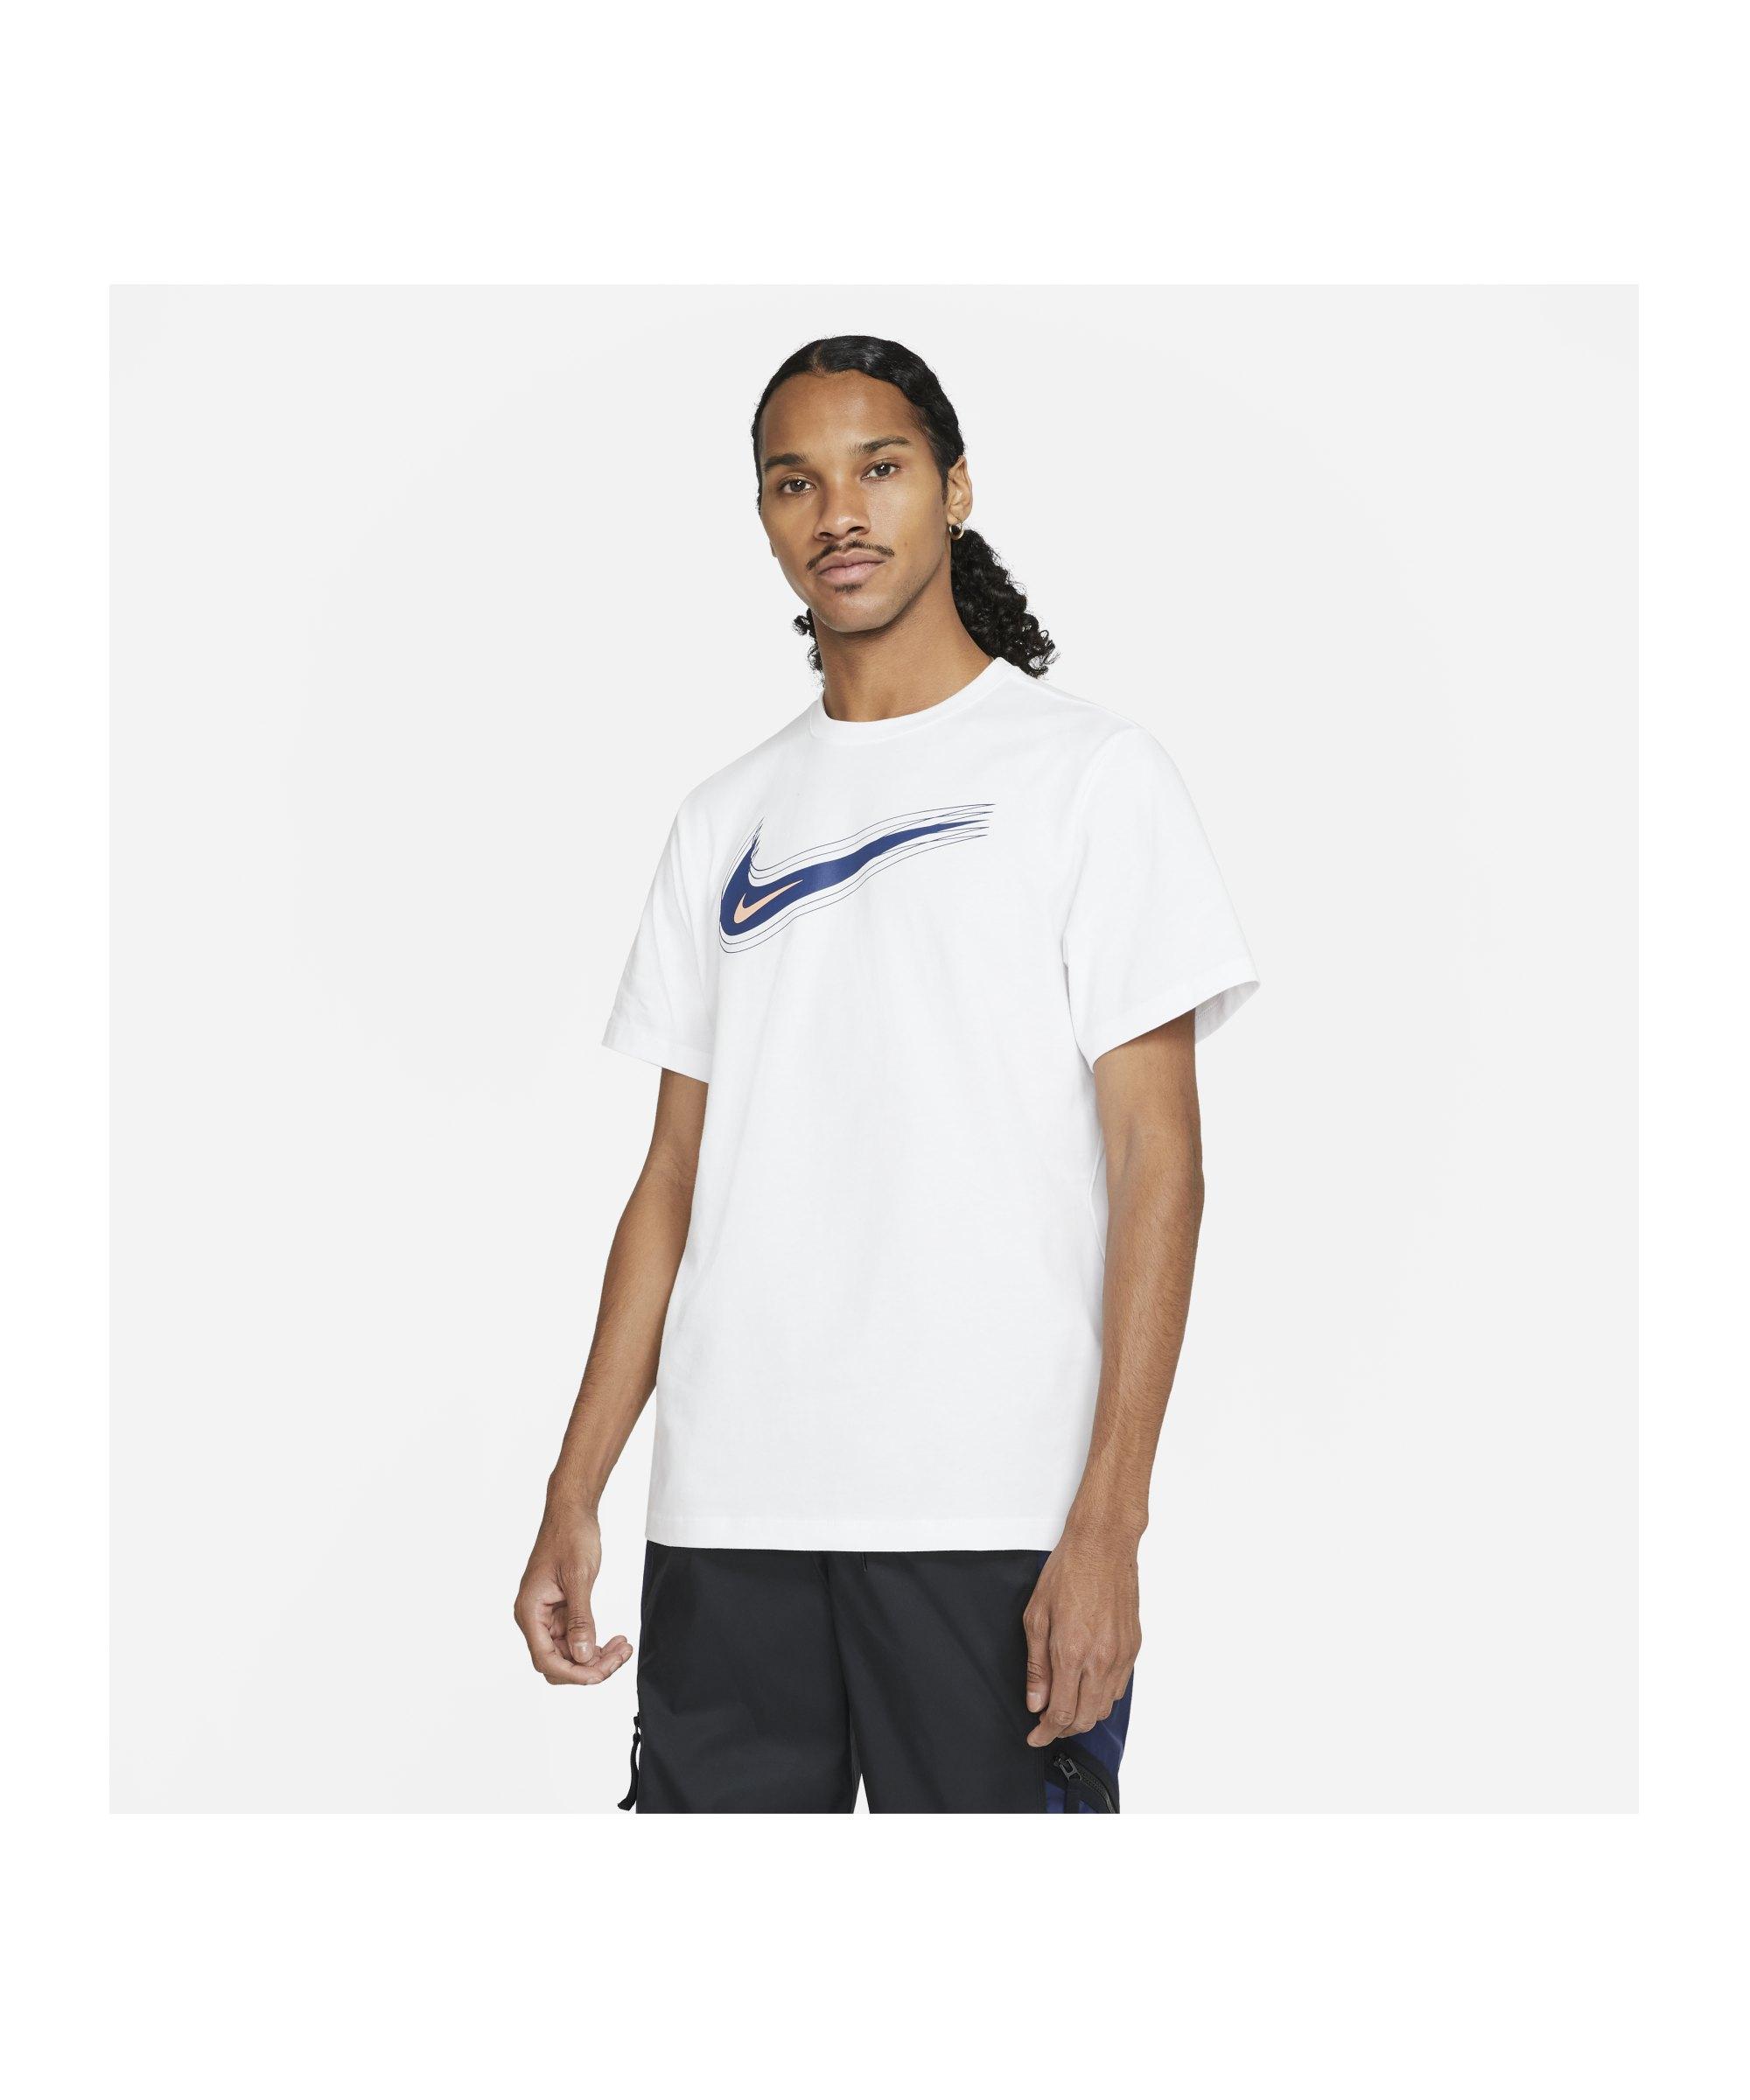 Nike Swoosh 12 Month T-Shirt Weiss F100 - weiss